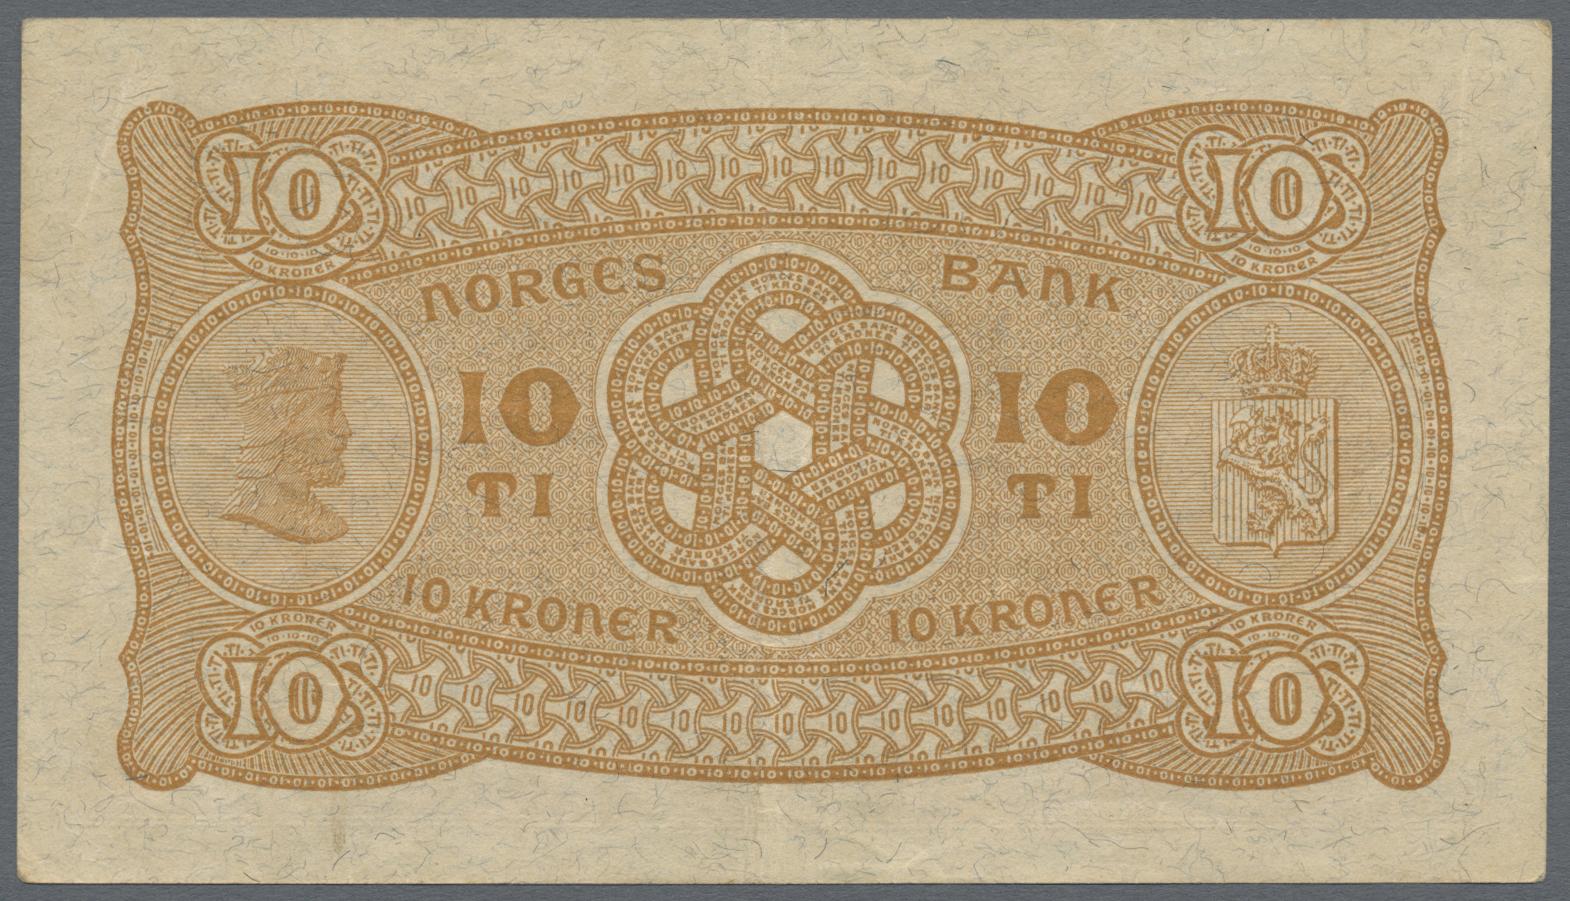 Lot 00570 - Norway / Norwegen | Banknoten  -  Auktionshaus Christoph Gärtner GmbH & Co. KG Sale #48 The Banknotes